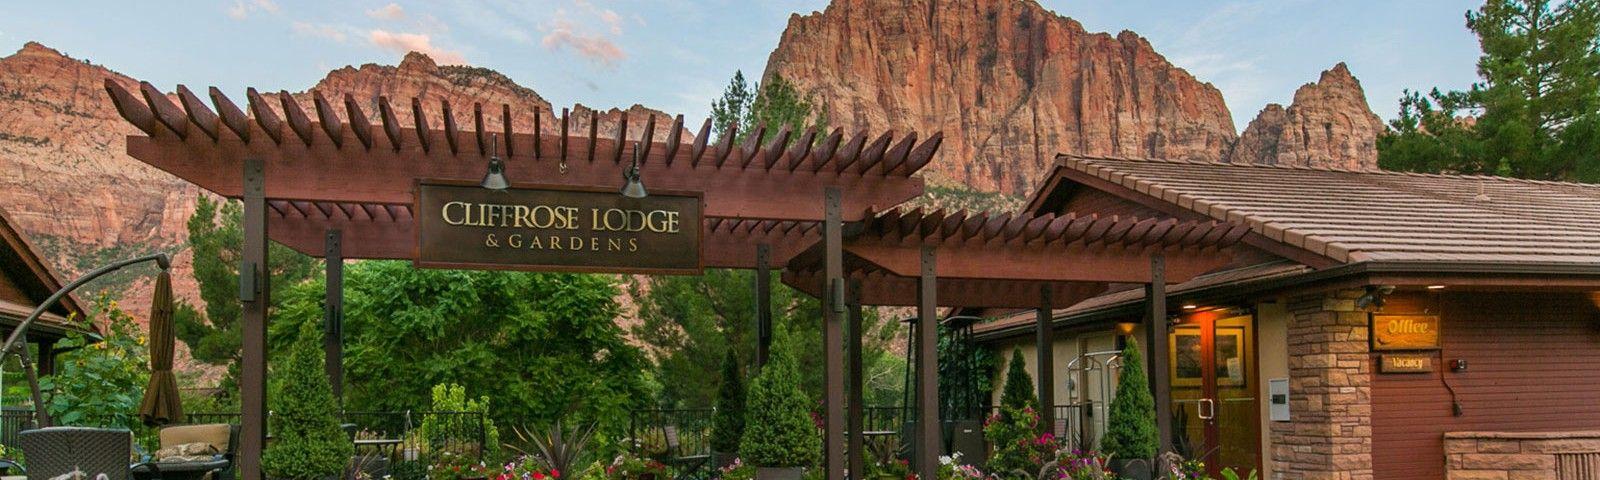 ee6db1568689b38beabae441b159d9a5 - Cliffrose Lodge & Gardens At Zion Natl Park